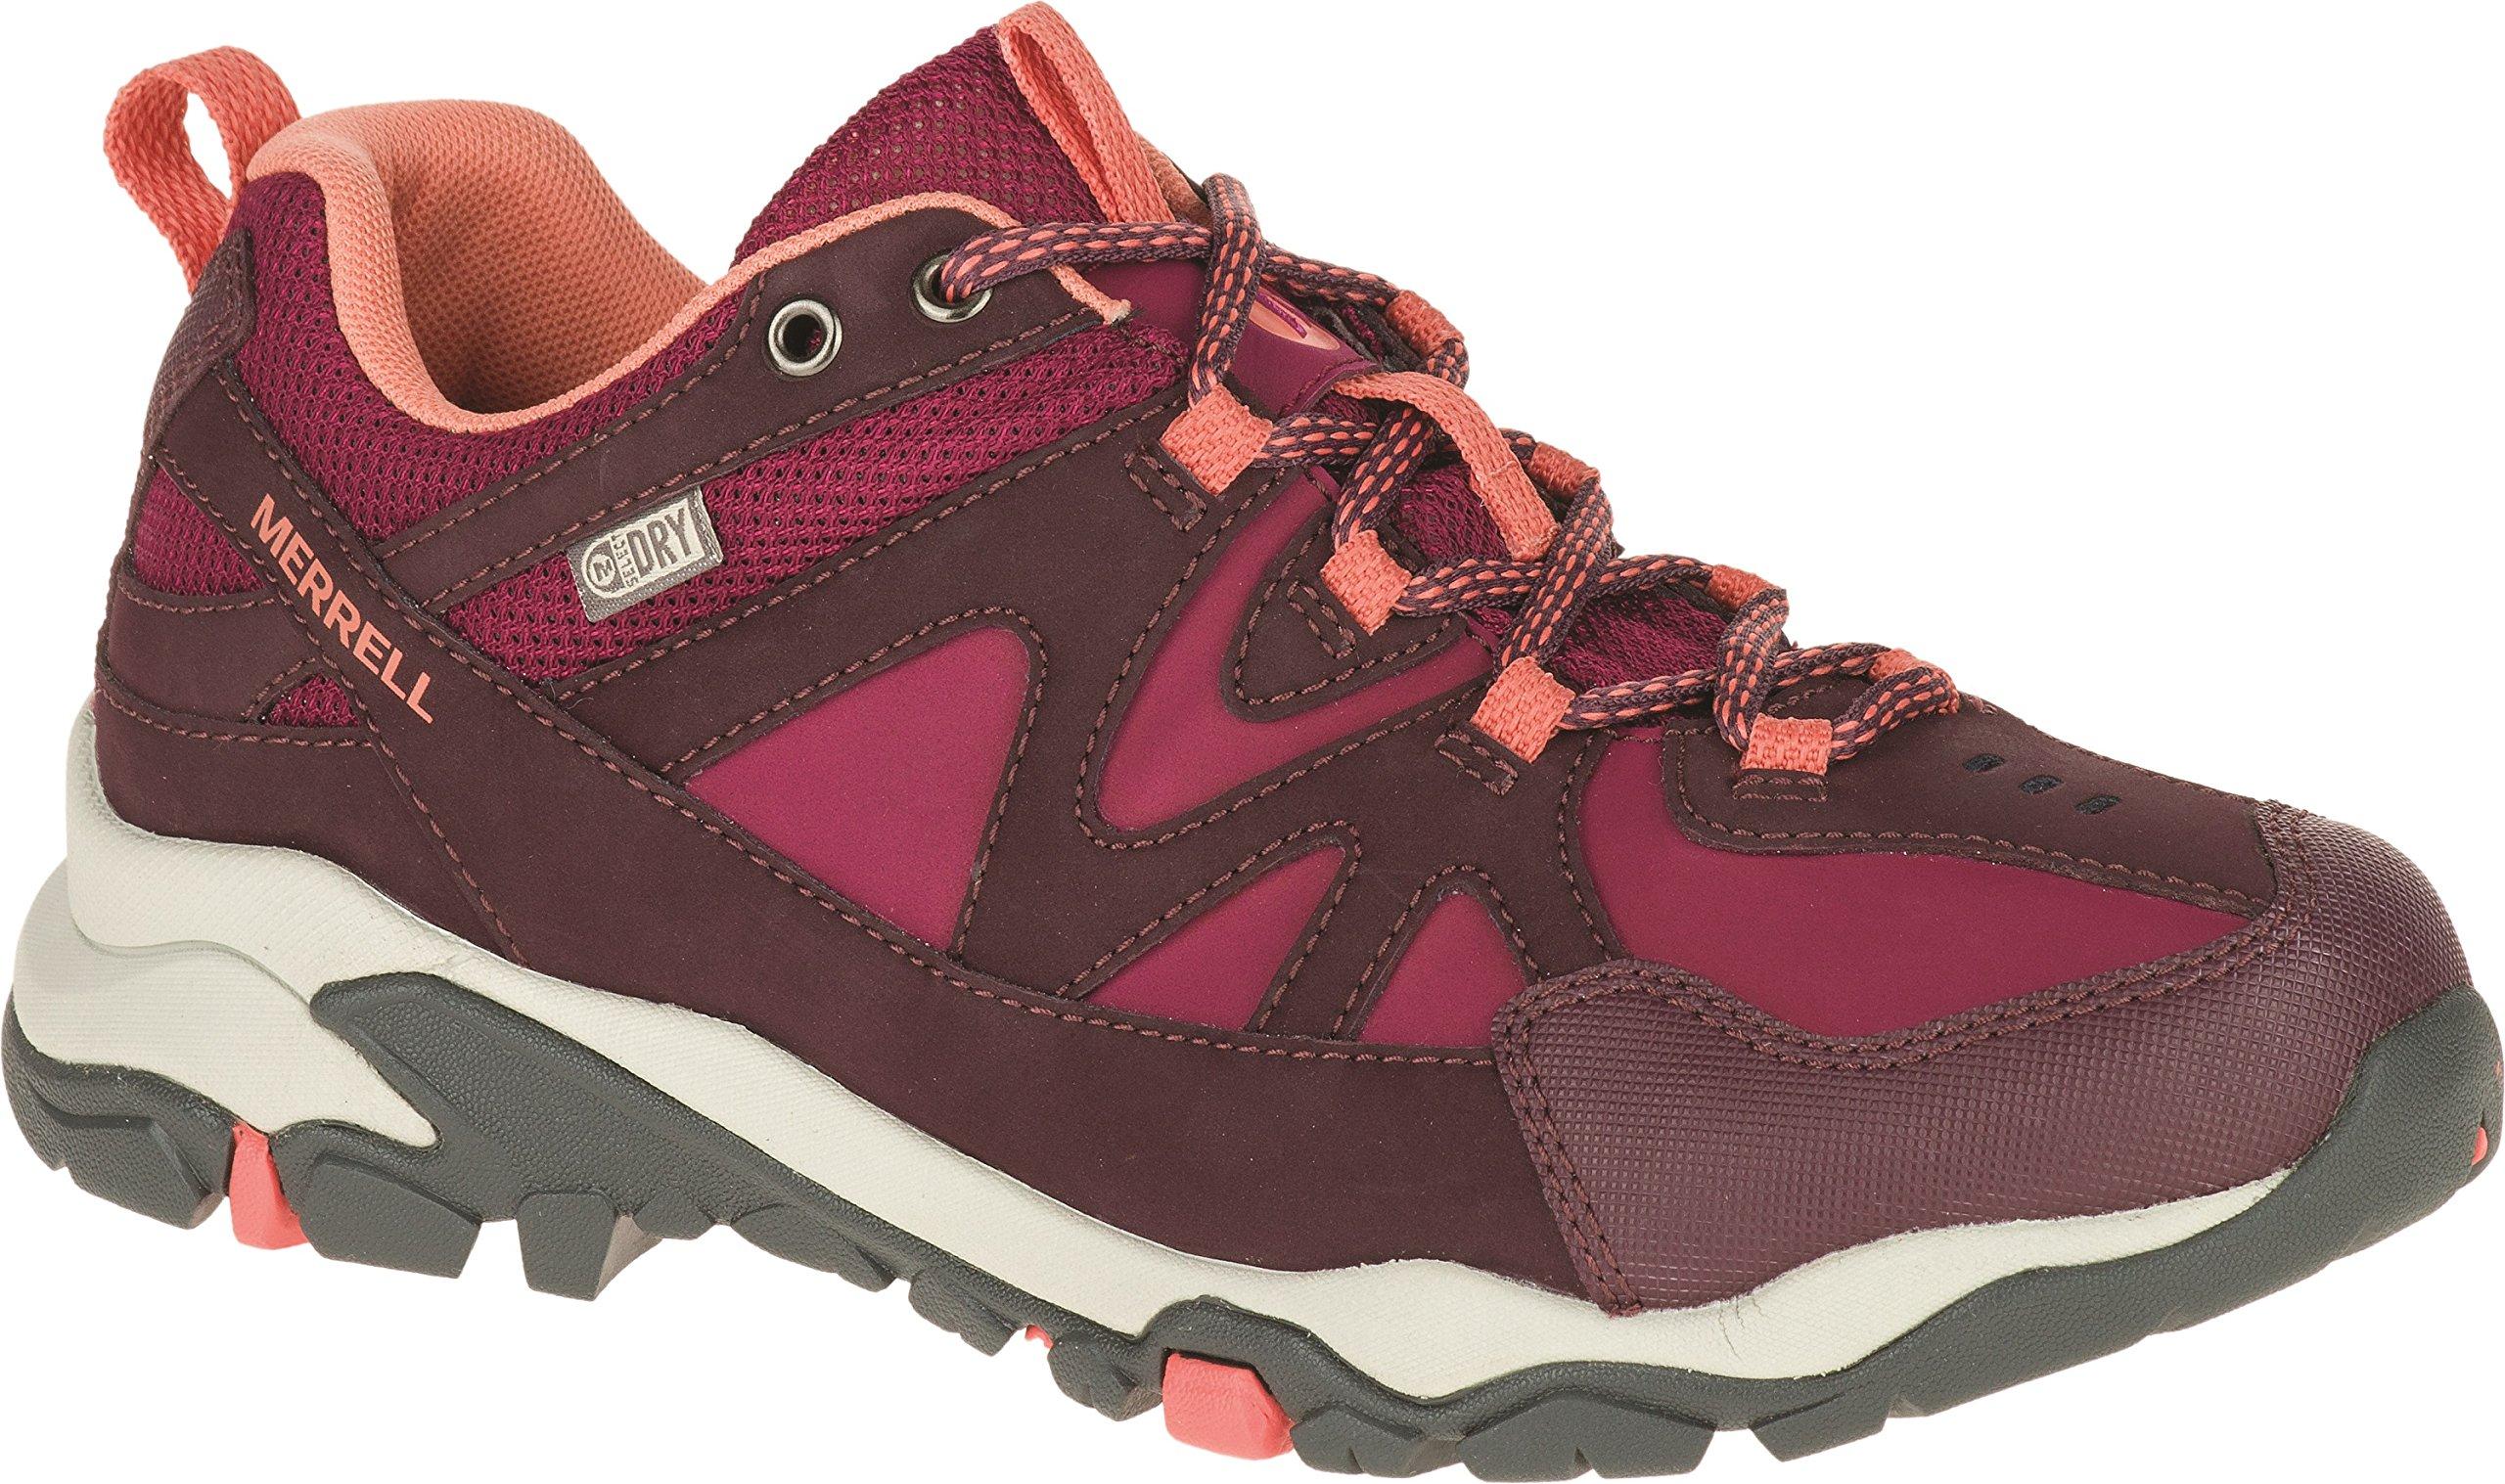 Merrell Women's Tahr Bolt Waterproof Low Rise Hiking Shoes 1